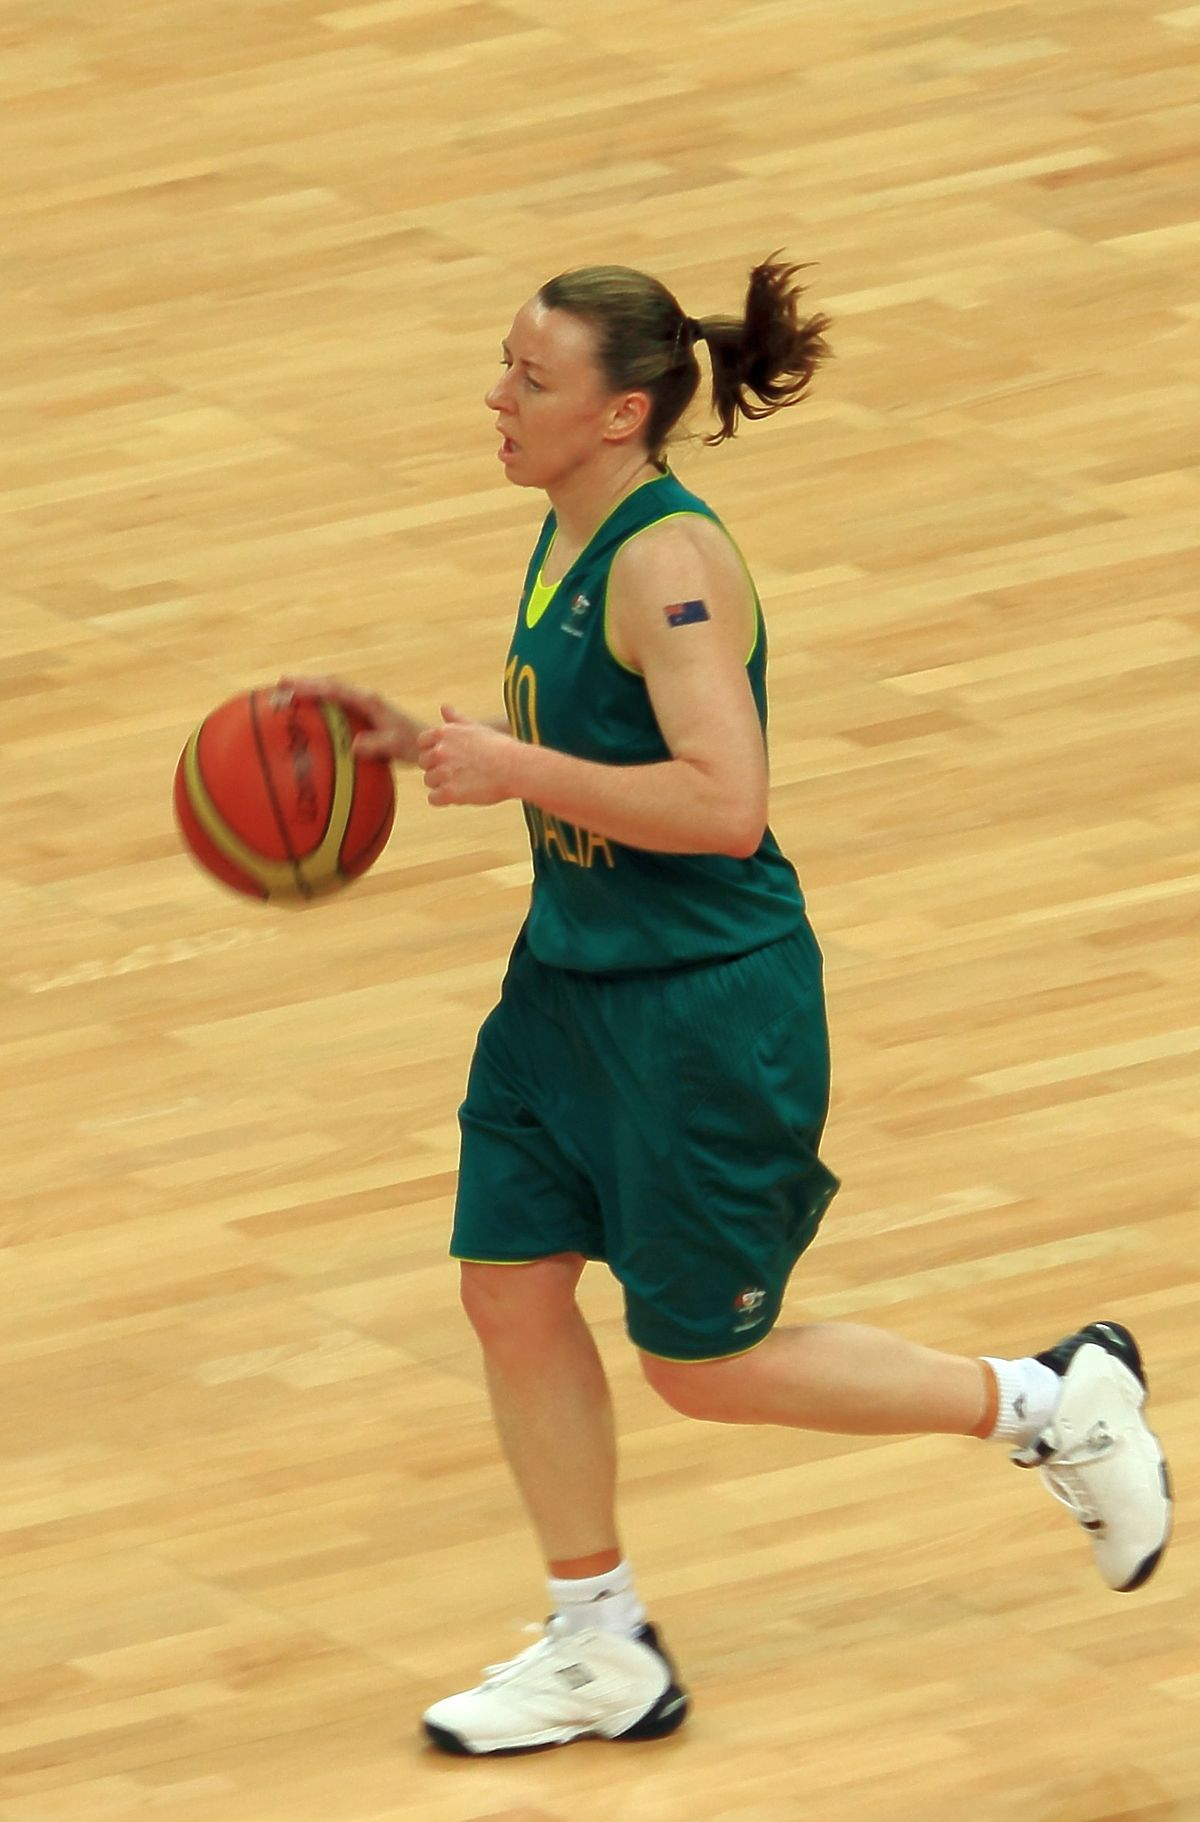 Kristi Harrower - Wikipedia